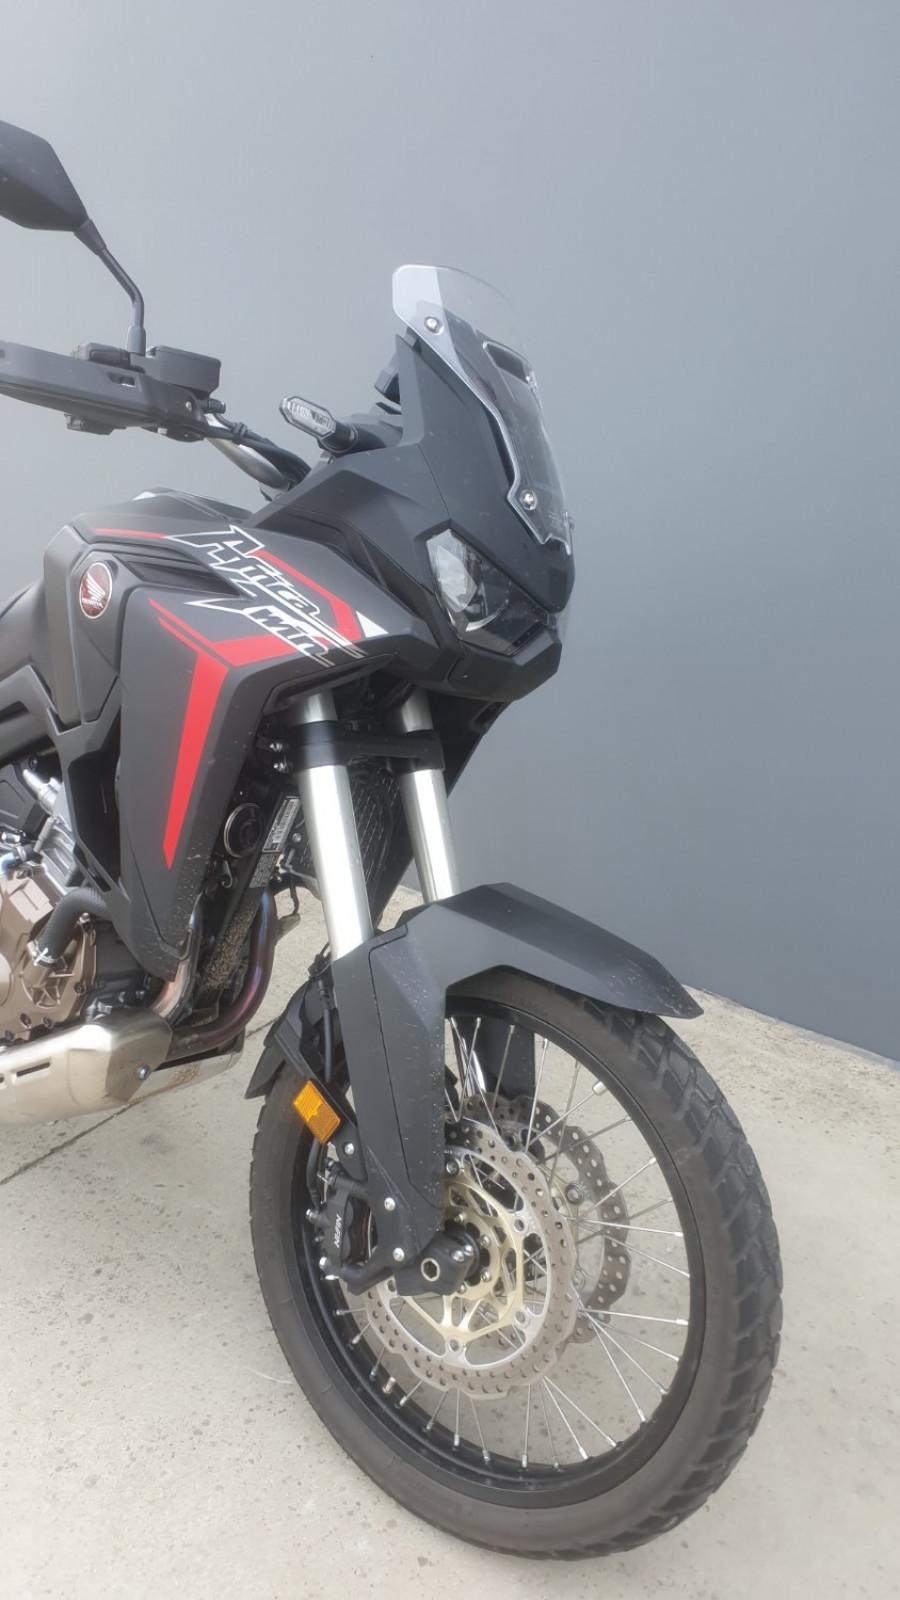 2020 Honda CRF1100AL2 TEMP 2020 Africa Twin Motorcycle Image 14